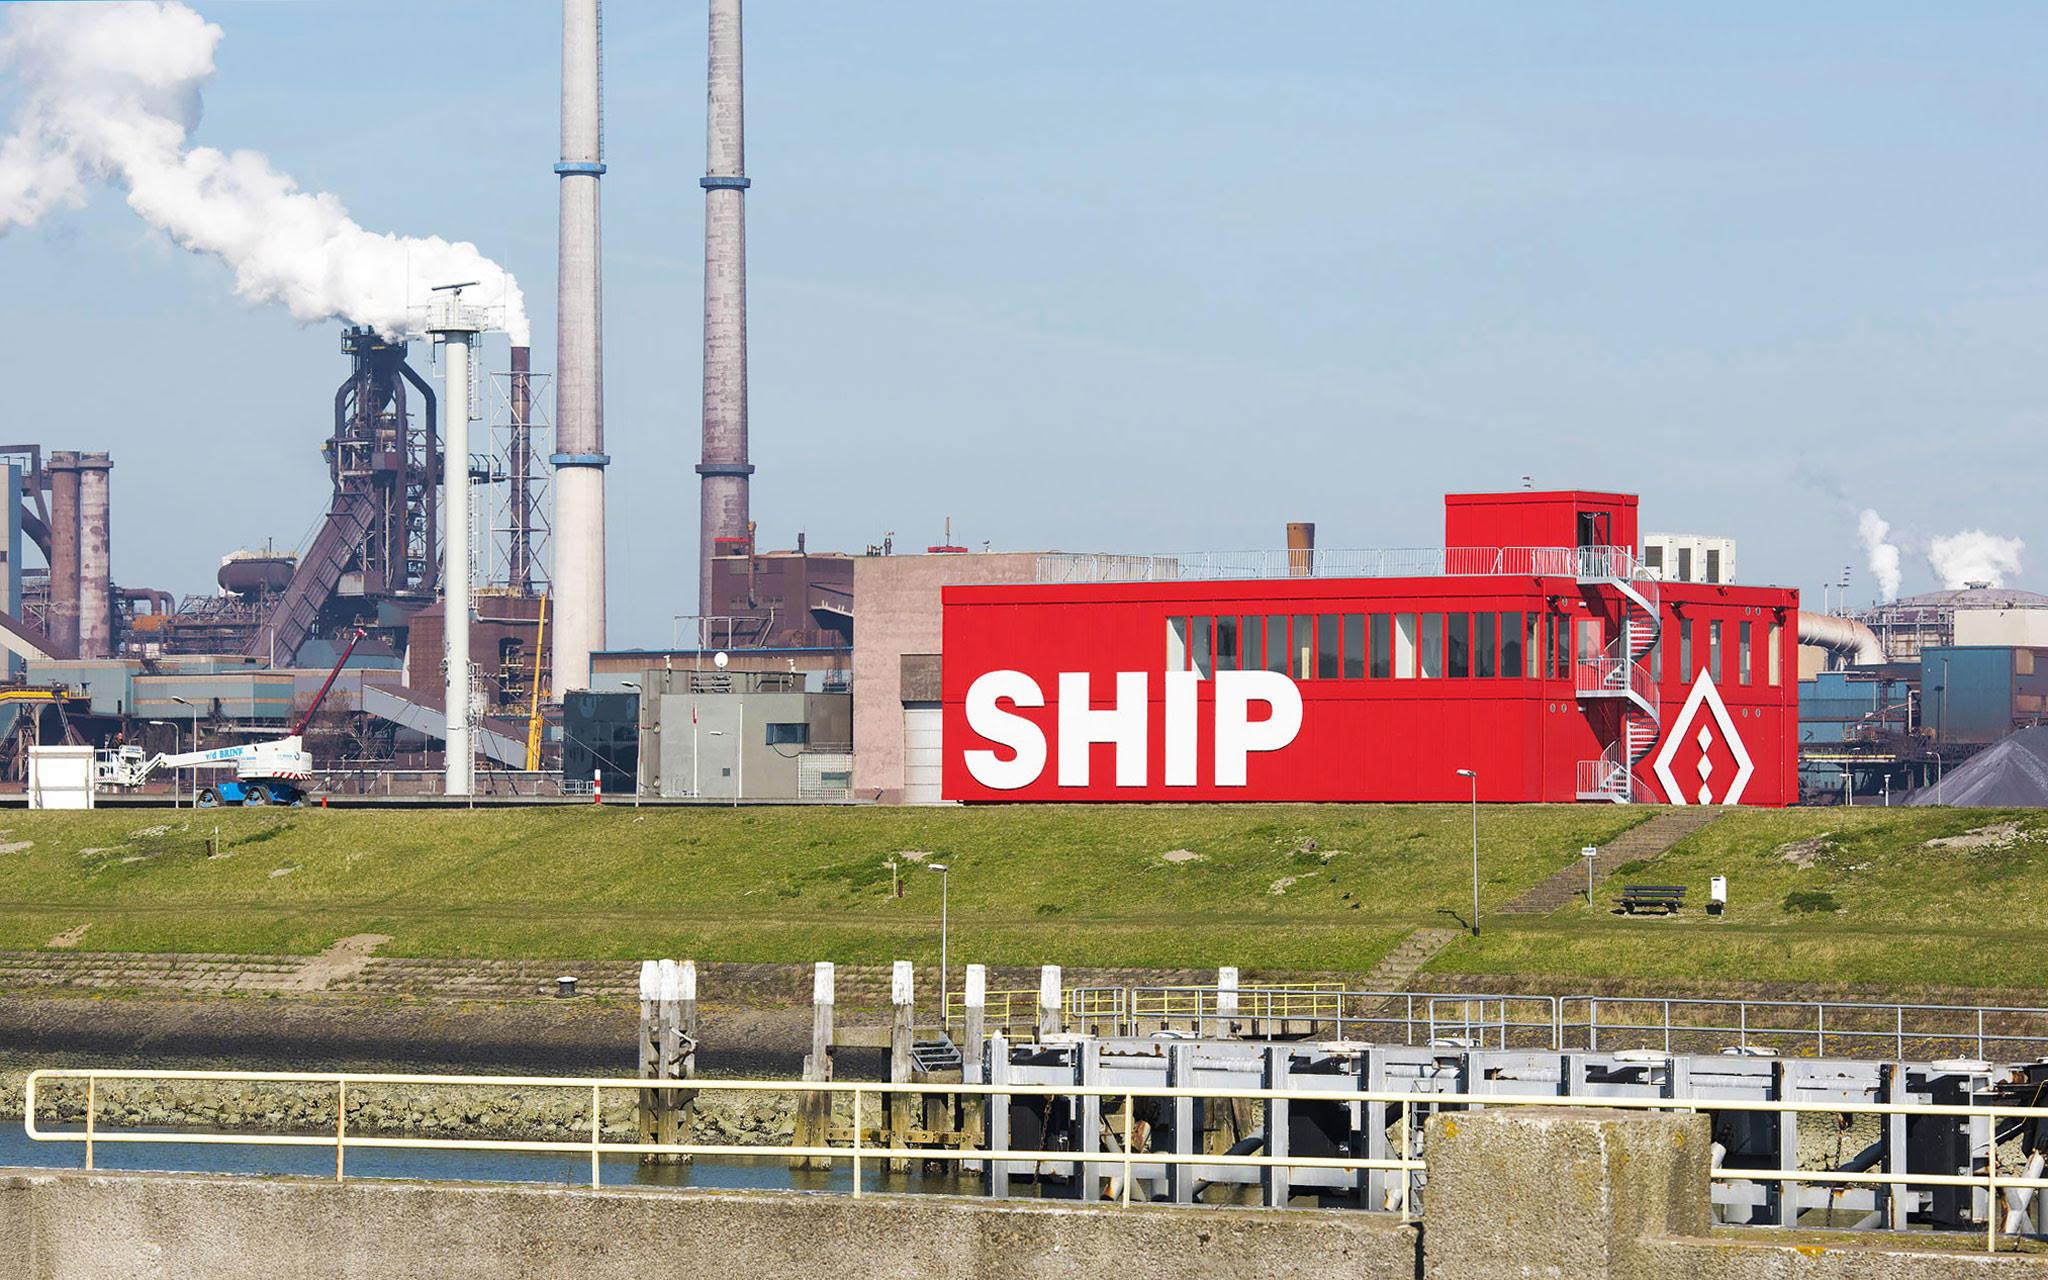 SHIP foto rode gebouw in IJmuiden